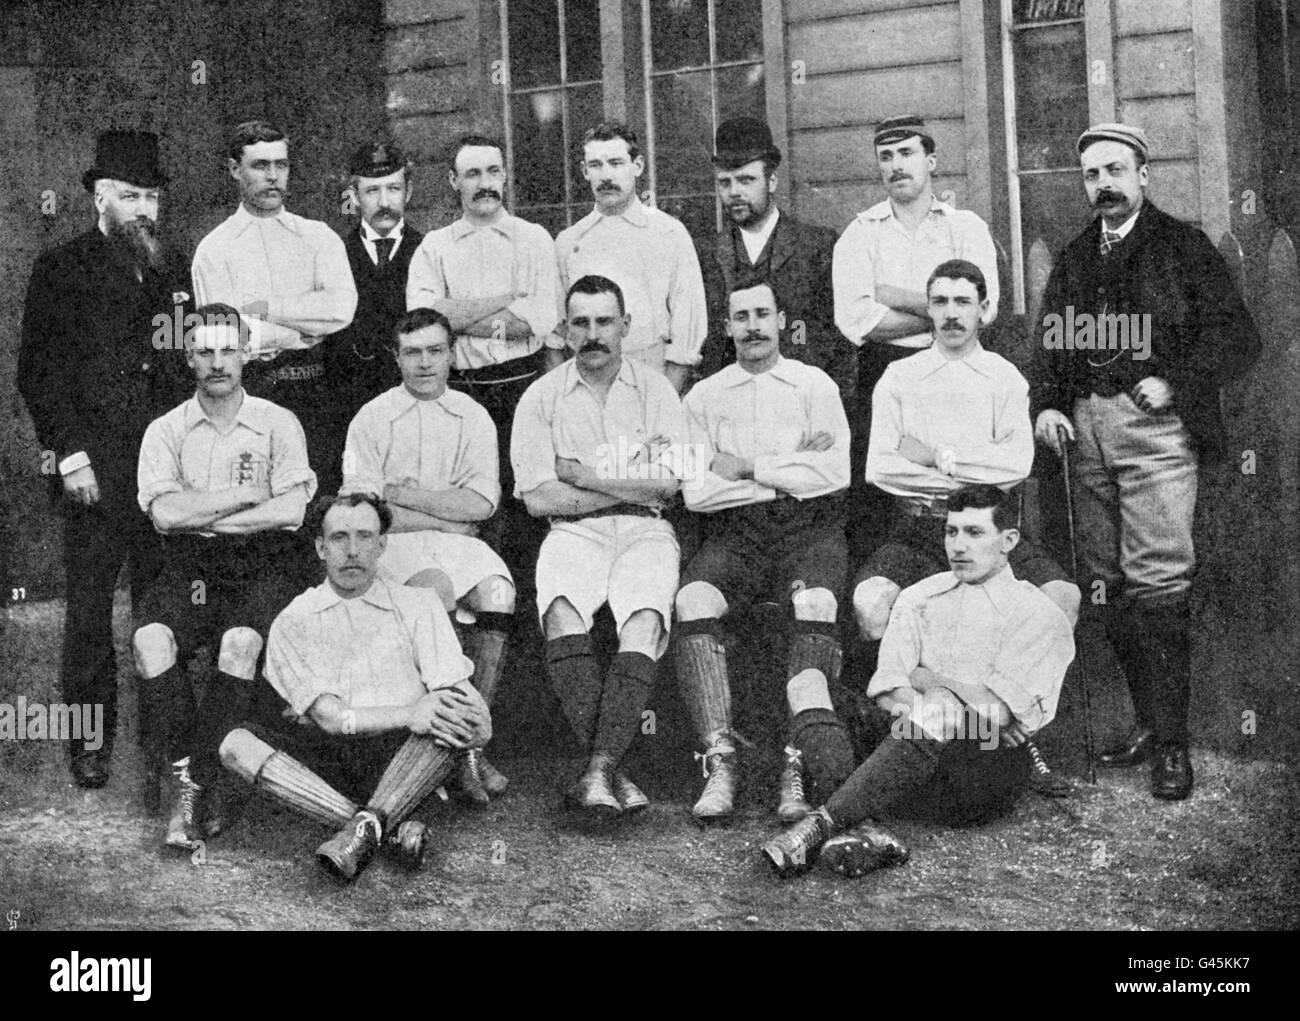 Soccer - English League Team - Stock Image